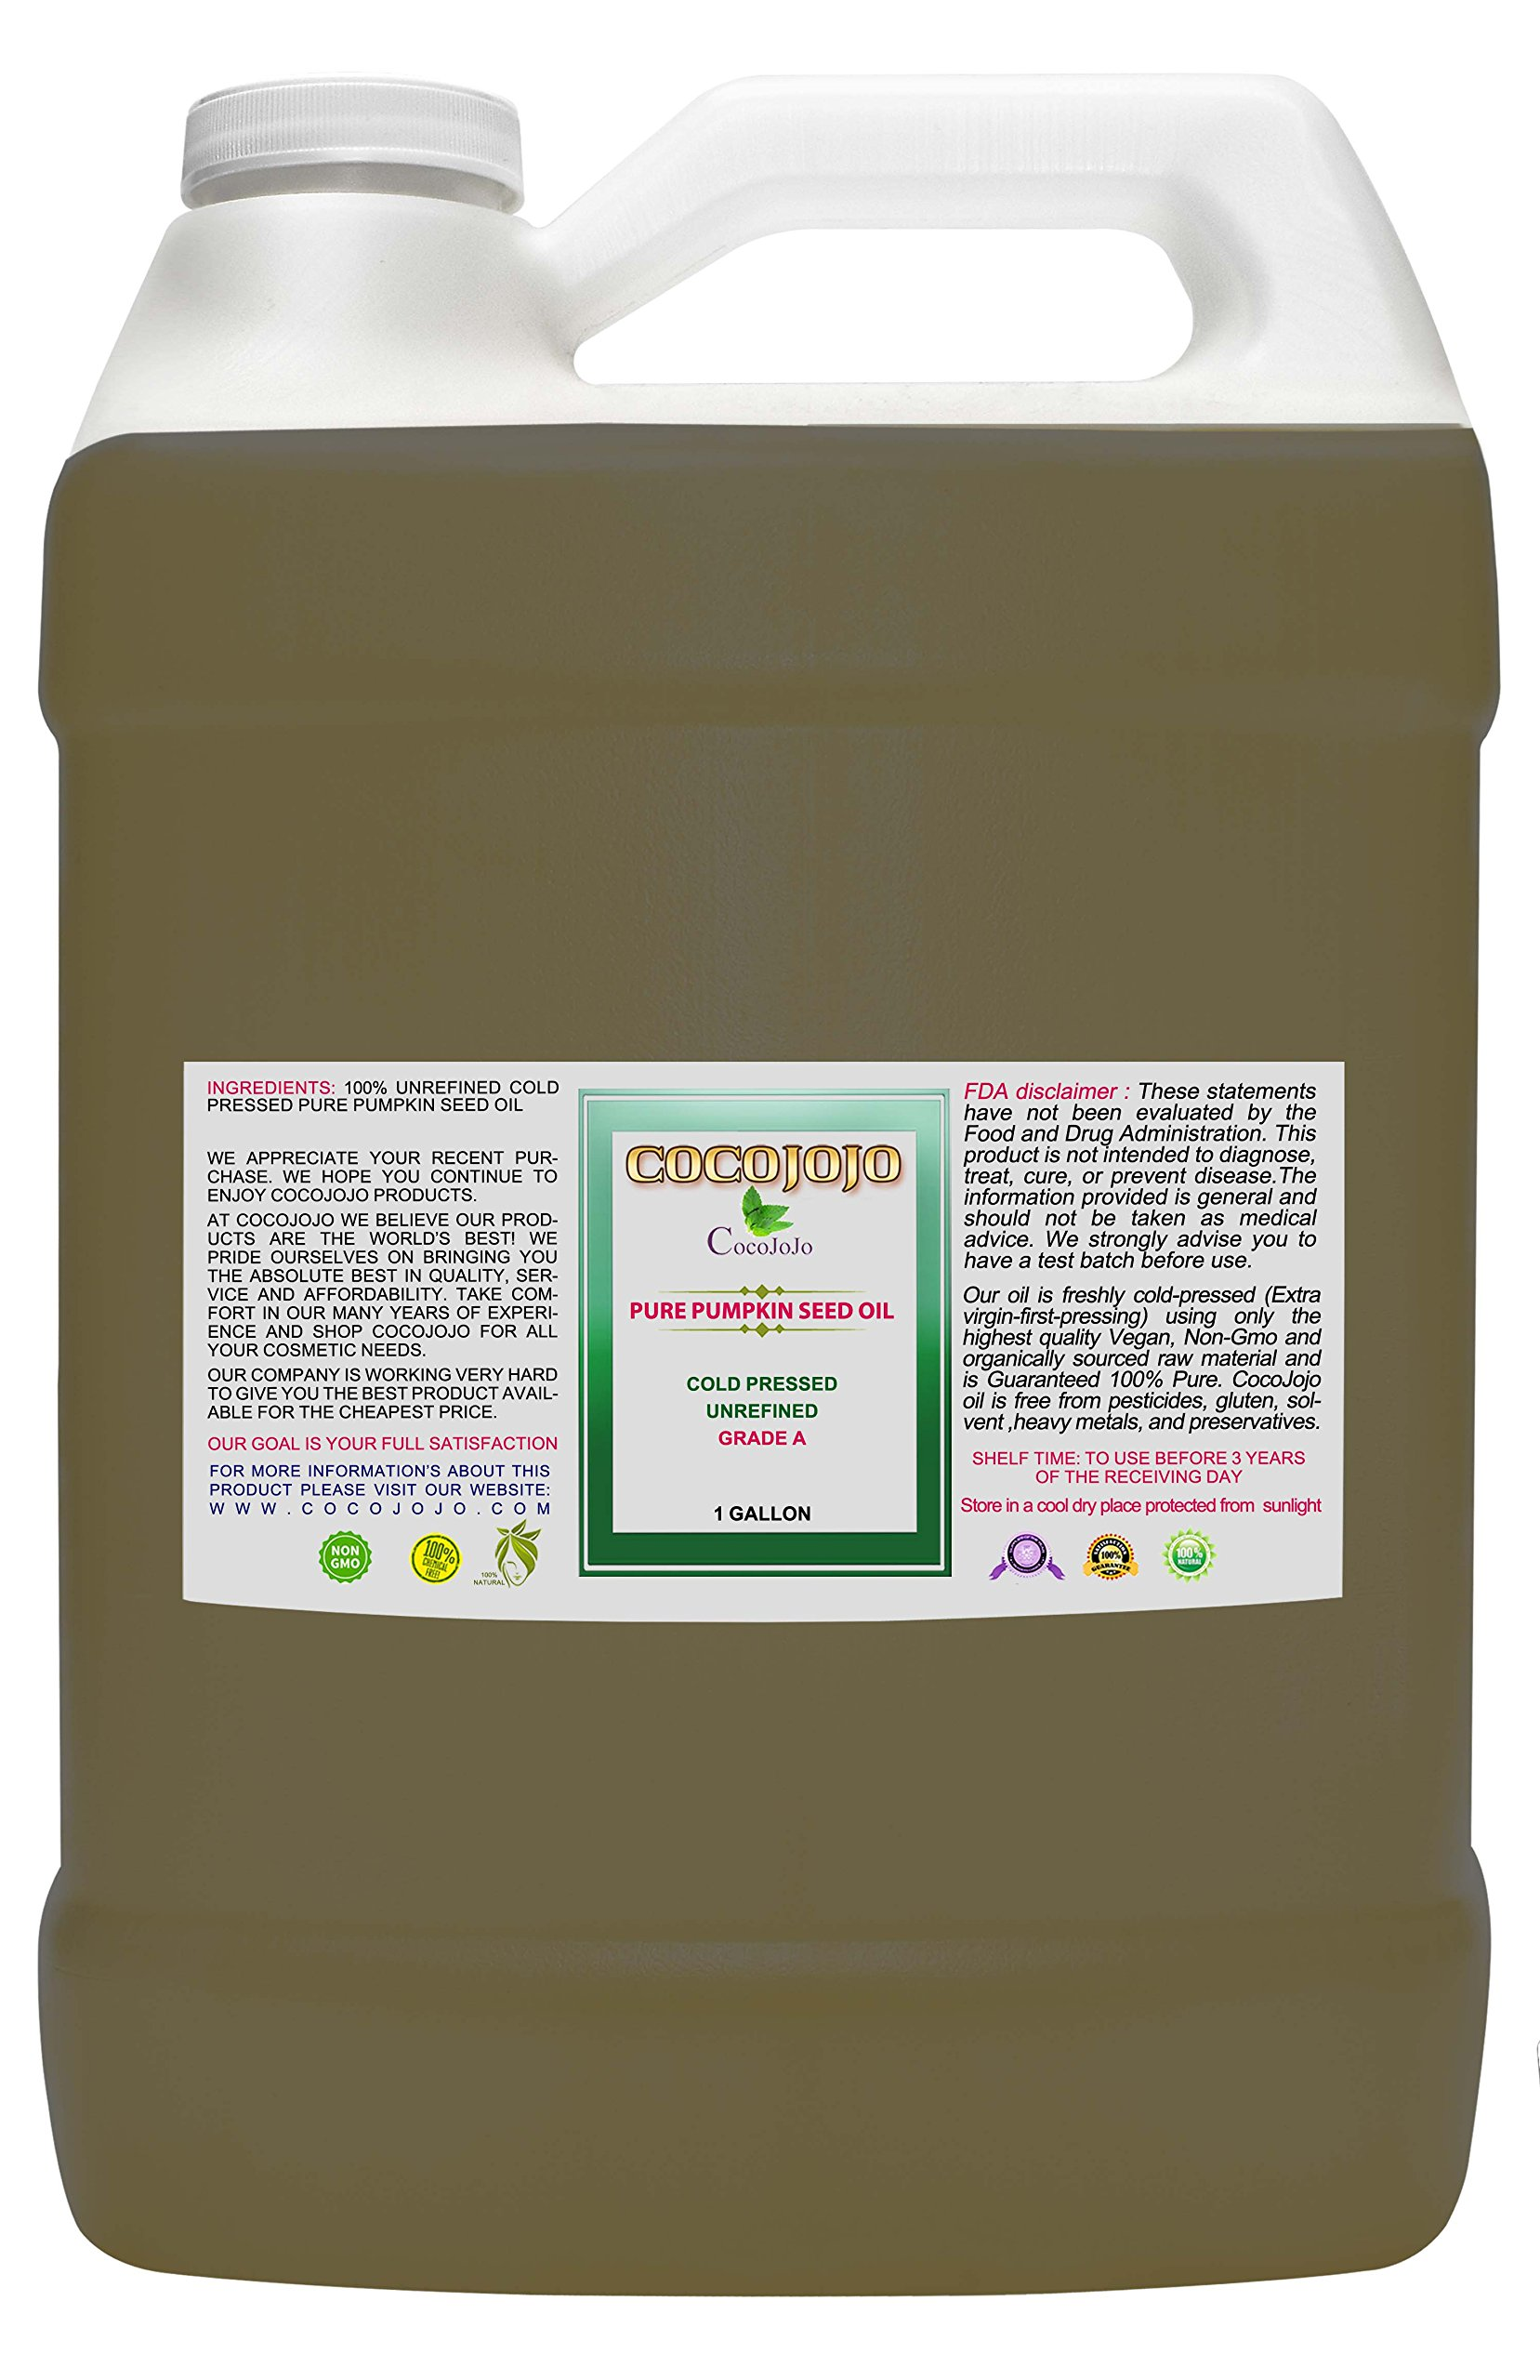 PUMPKIN SEED OIL - 1 Gallon Pumpkin Seed Oil 100% Pure Natural Totally Unrefined Cold Pressed Hair Regrowth Balding Premium Grade A